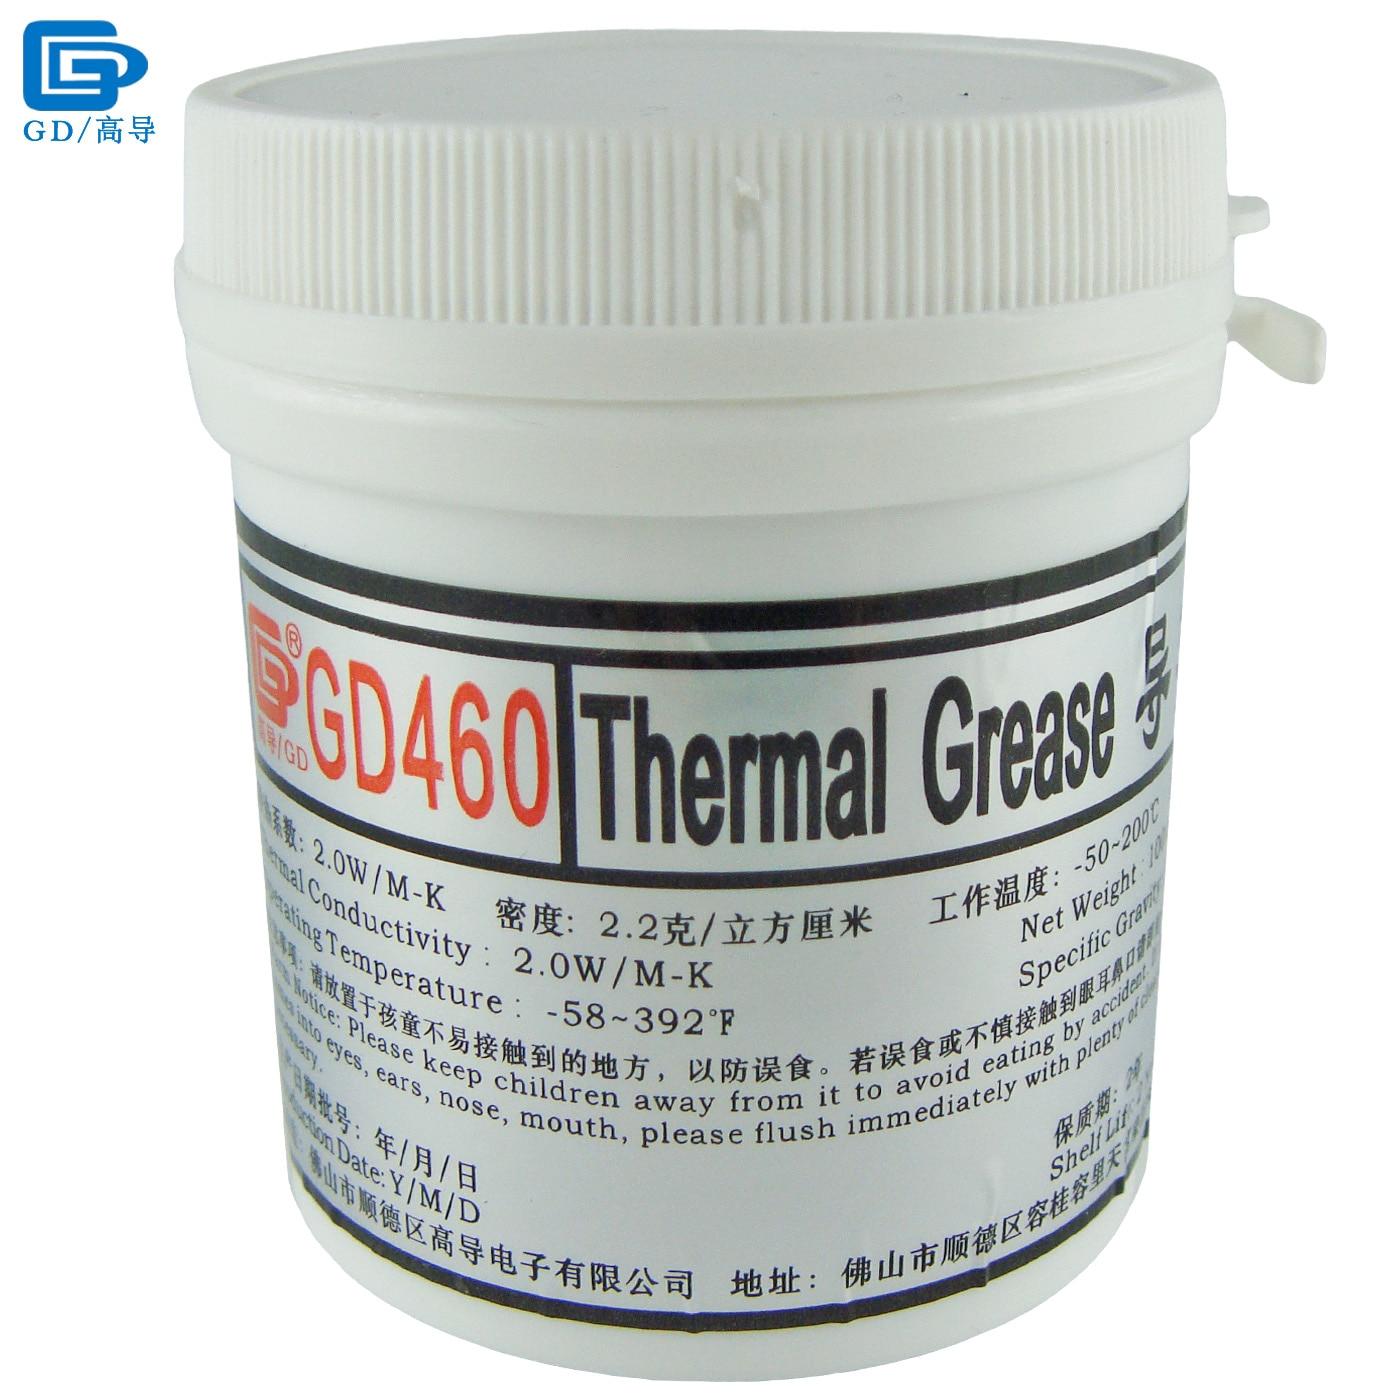 9c4a56d001805 GD460 الحرارية موصل لصق الشحوم سيليكون الجص الحرارة بالوعة مجمع الفضة صافي  الوزن 100 غرام ل LED وحدة المعالجة المركزية برودة CN100